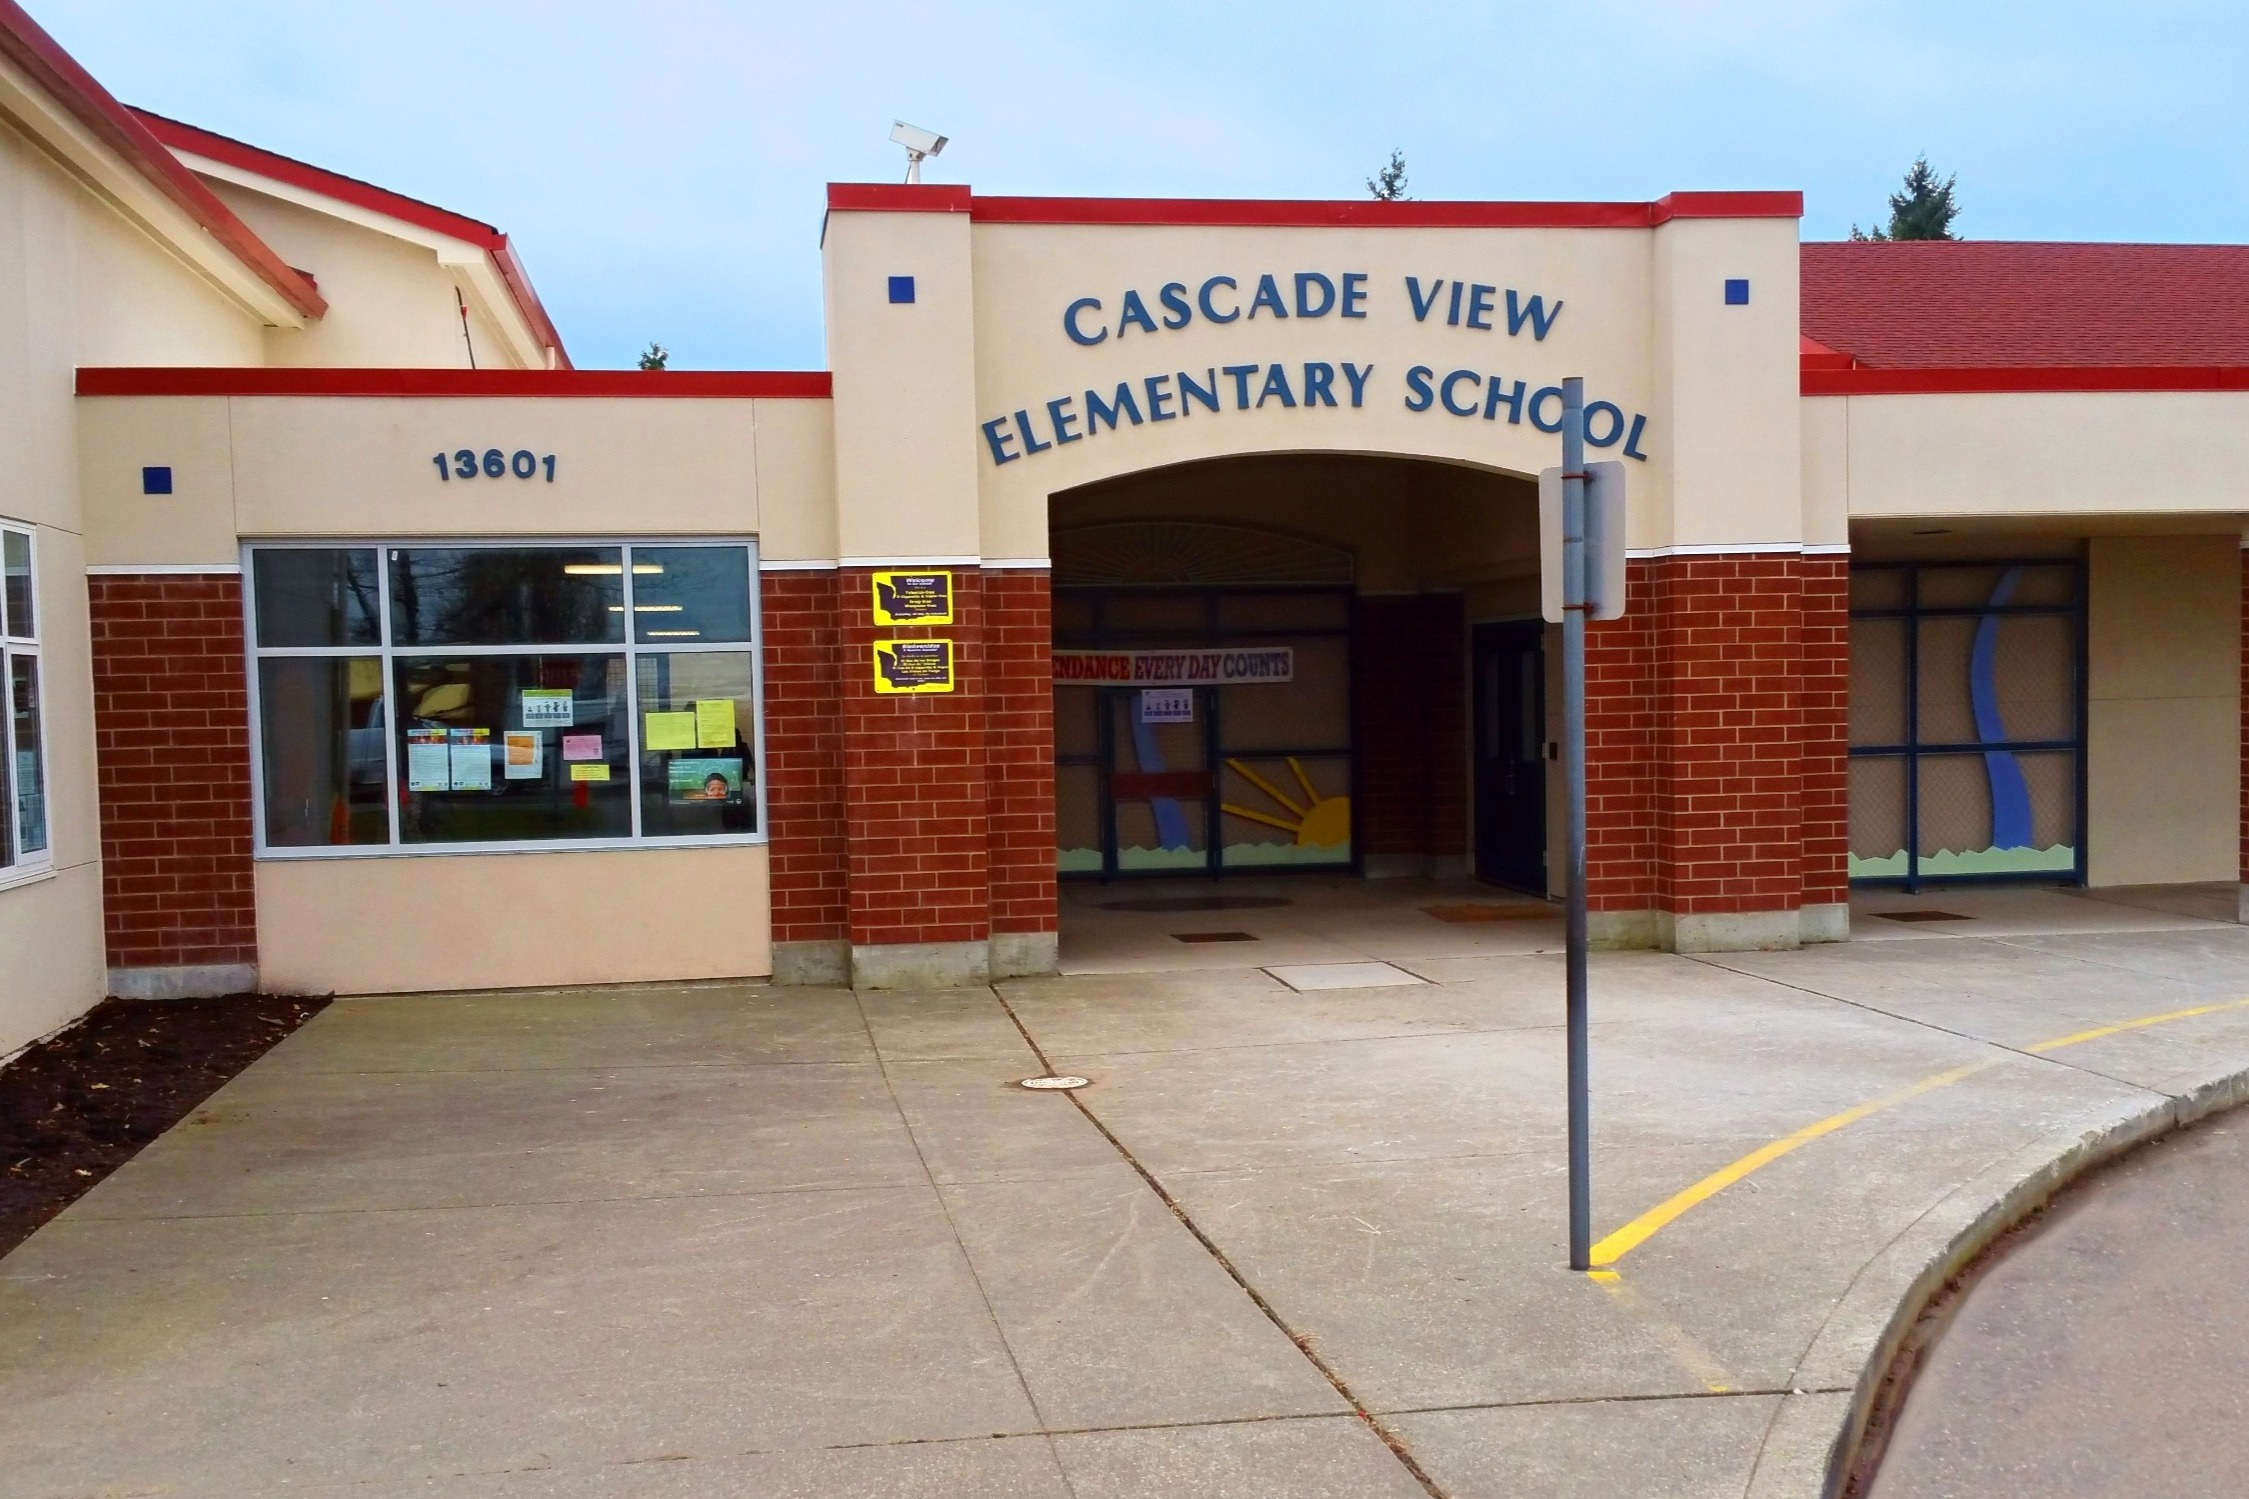 Cascade View Elementary School